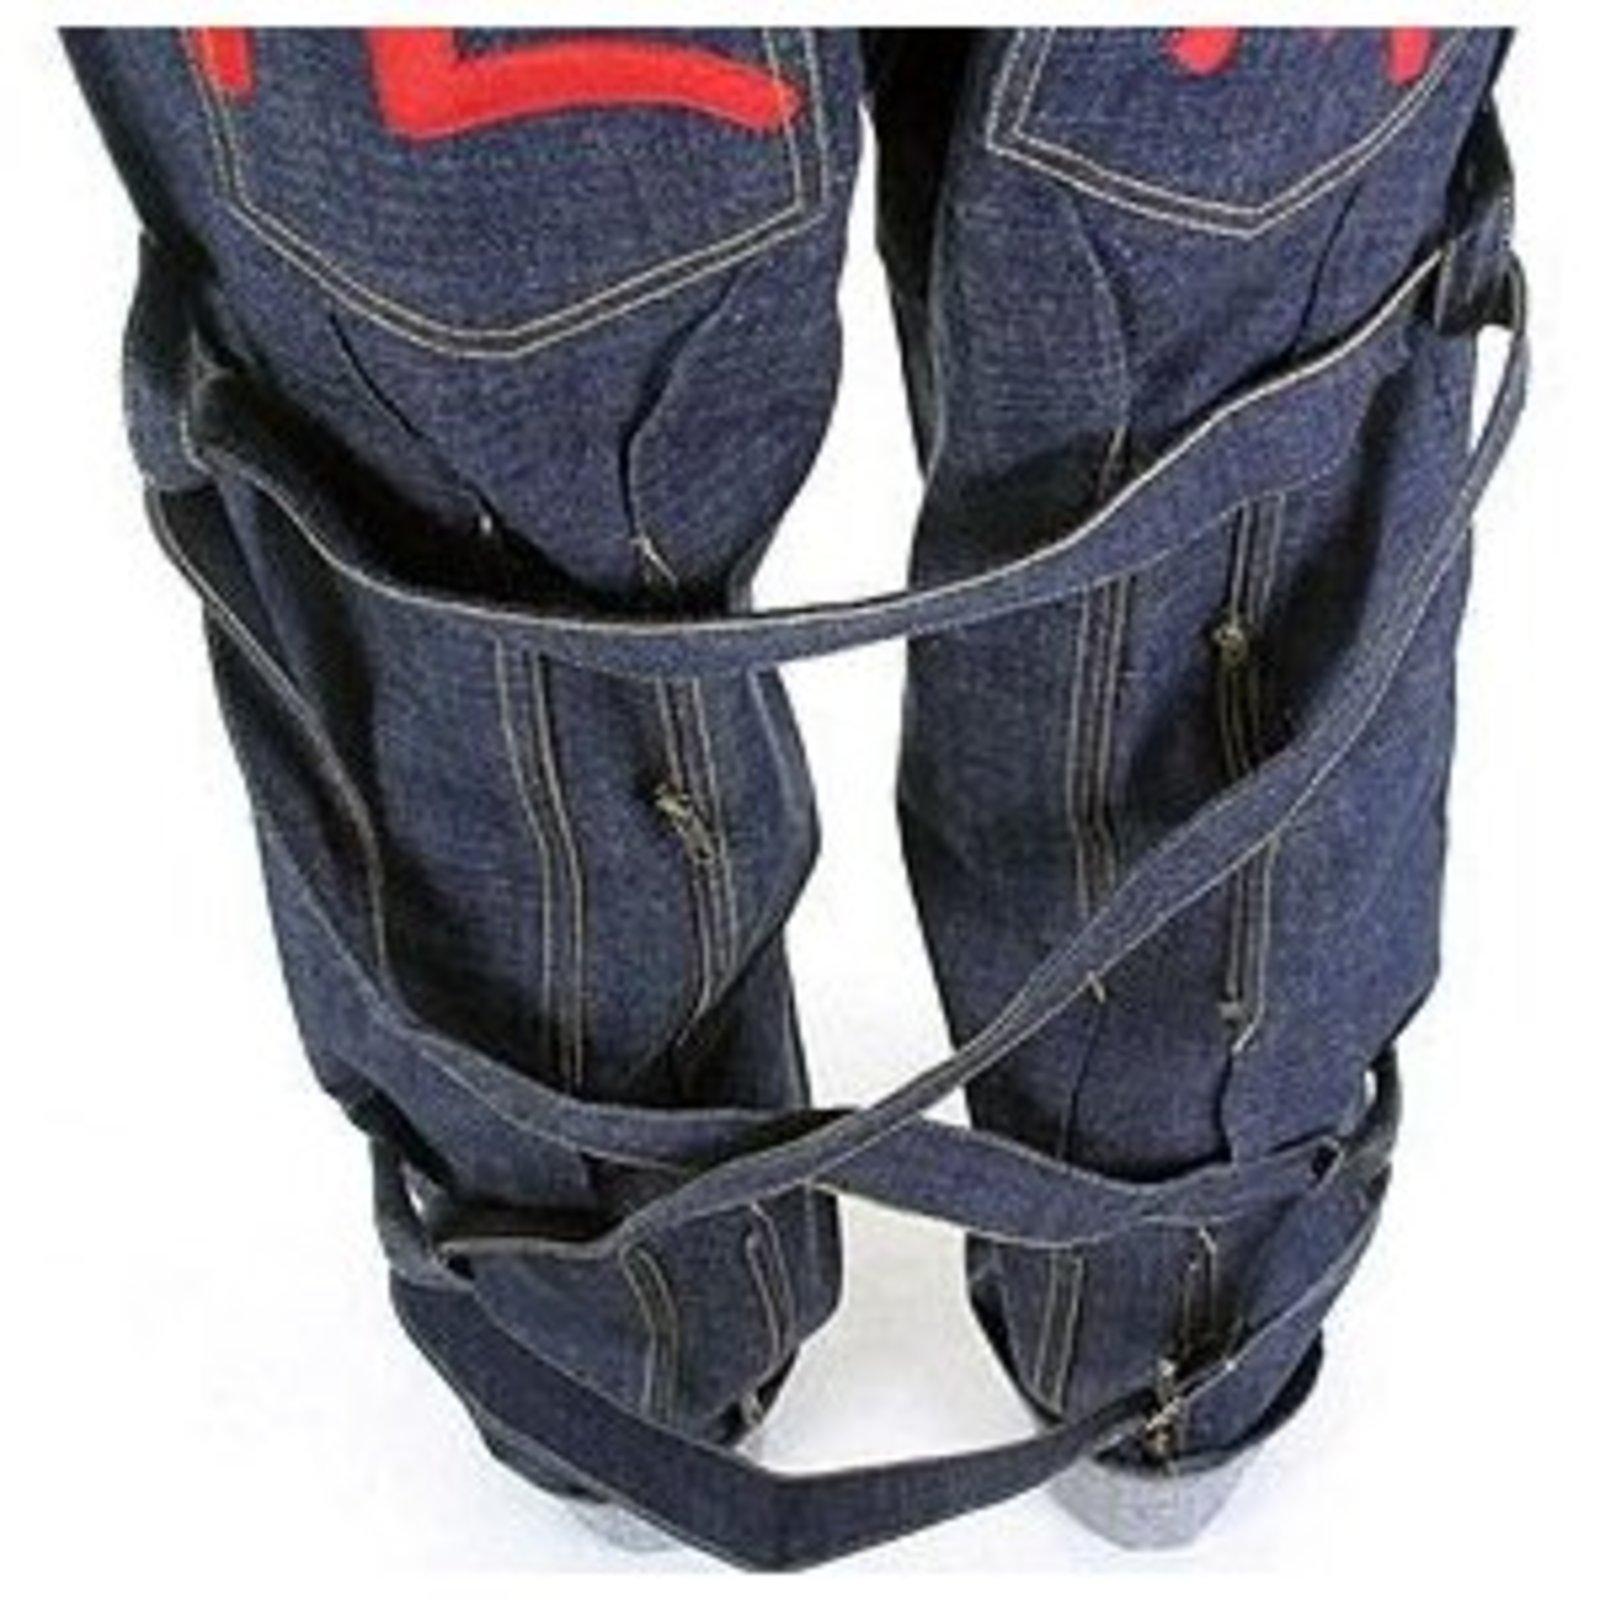 Evisu 'Bondage' denim jeans